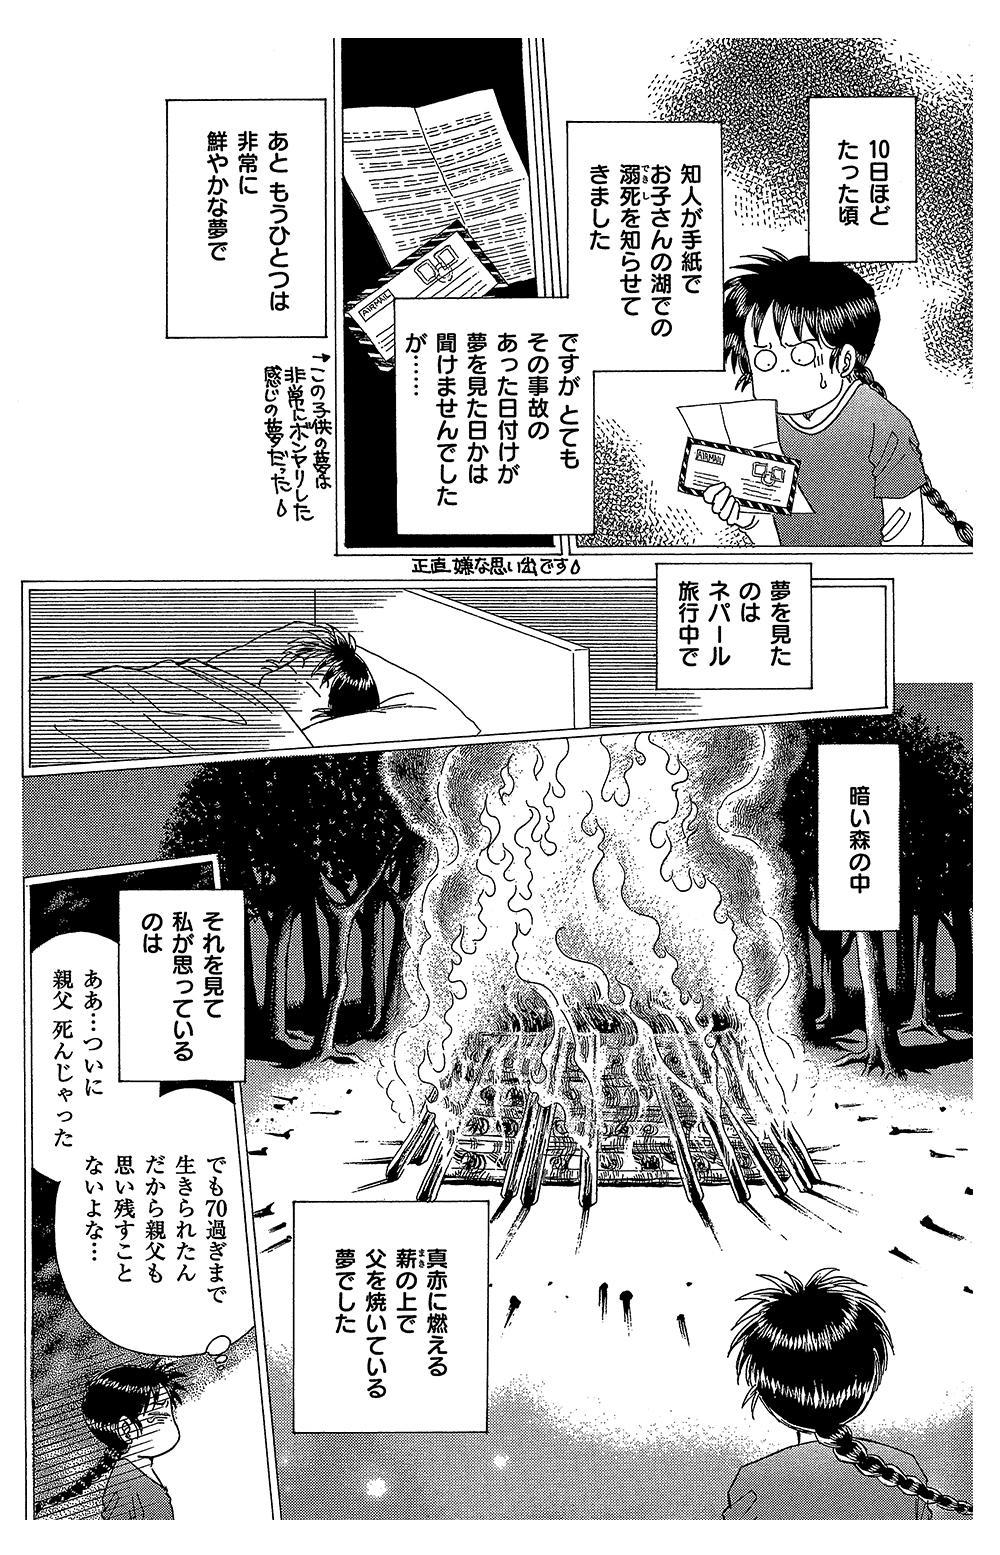 okaruto2-1-6.jpg